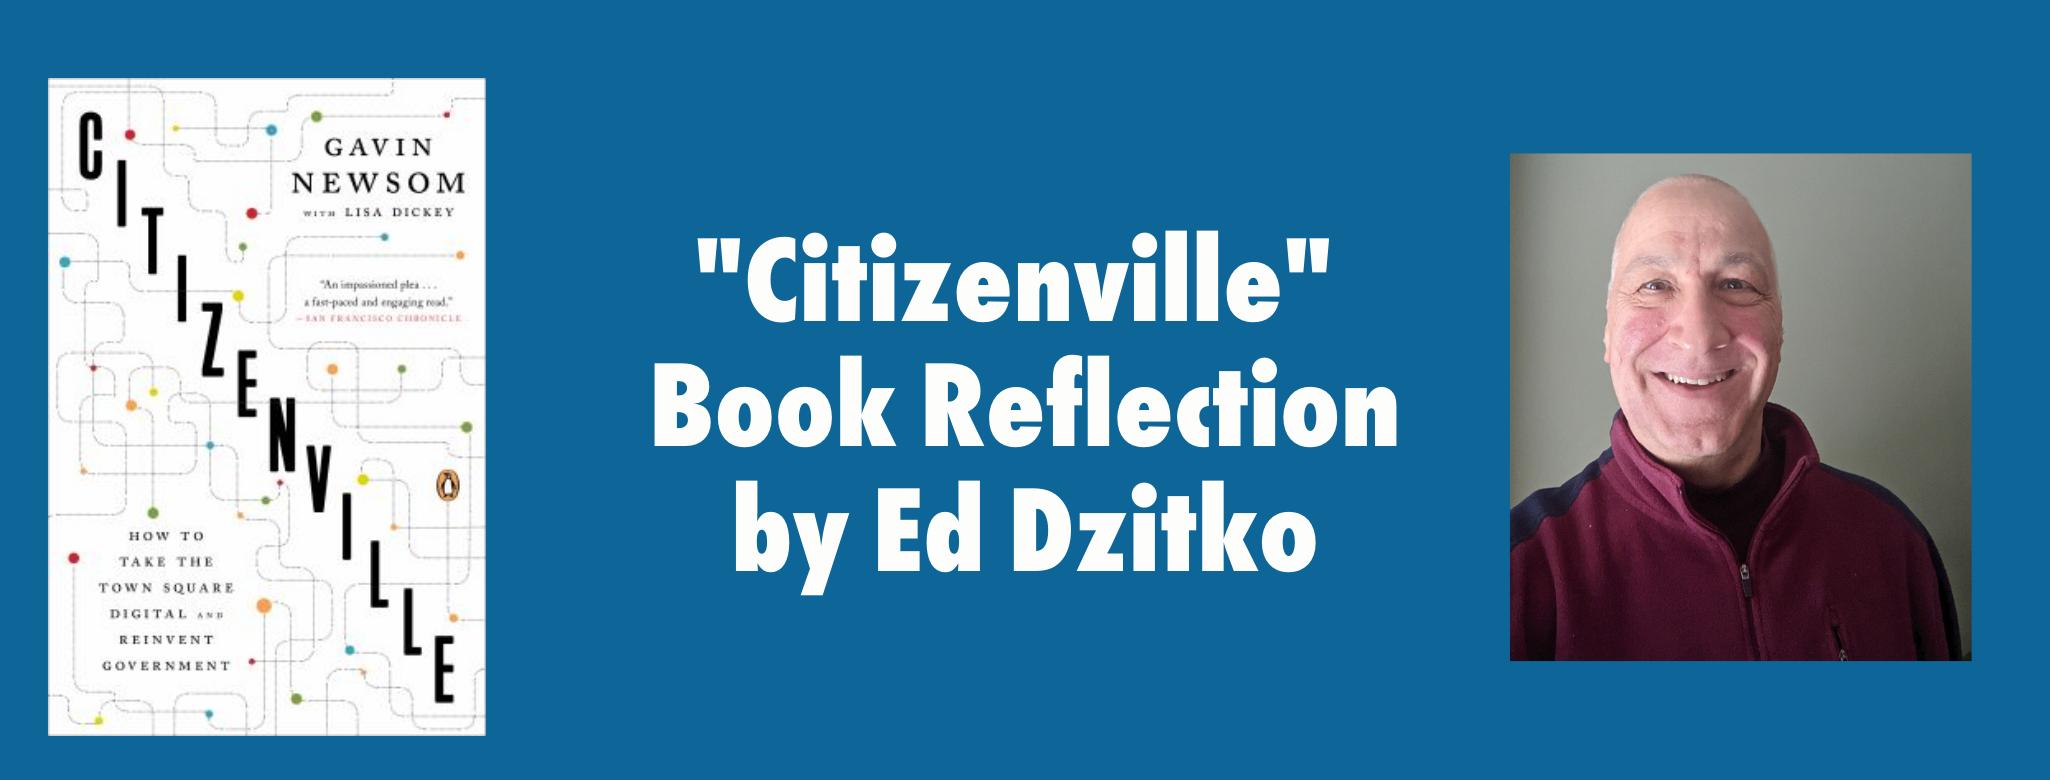 Citizenville Book Reflection Image